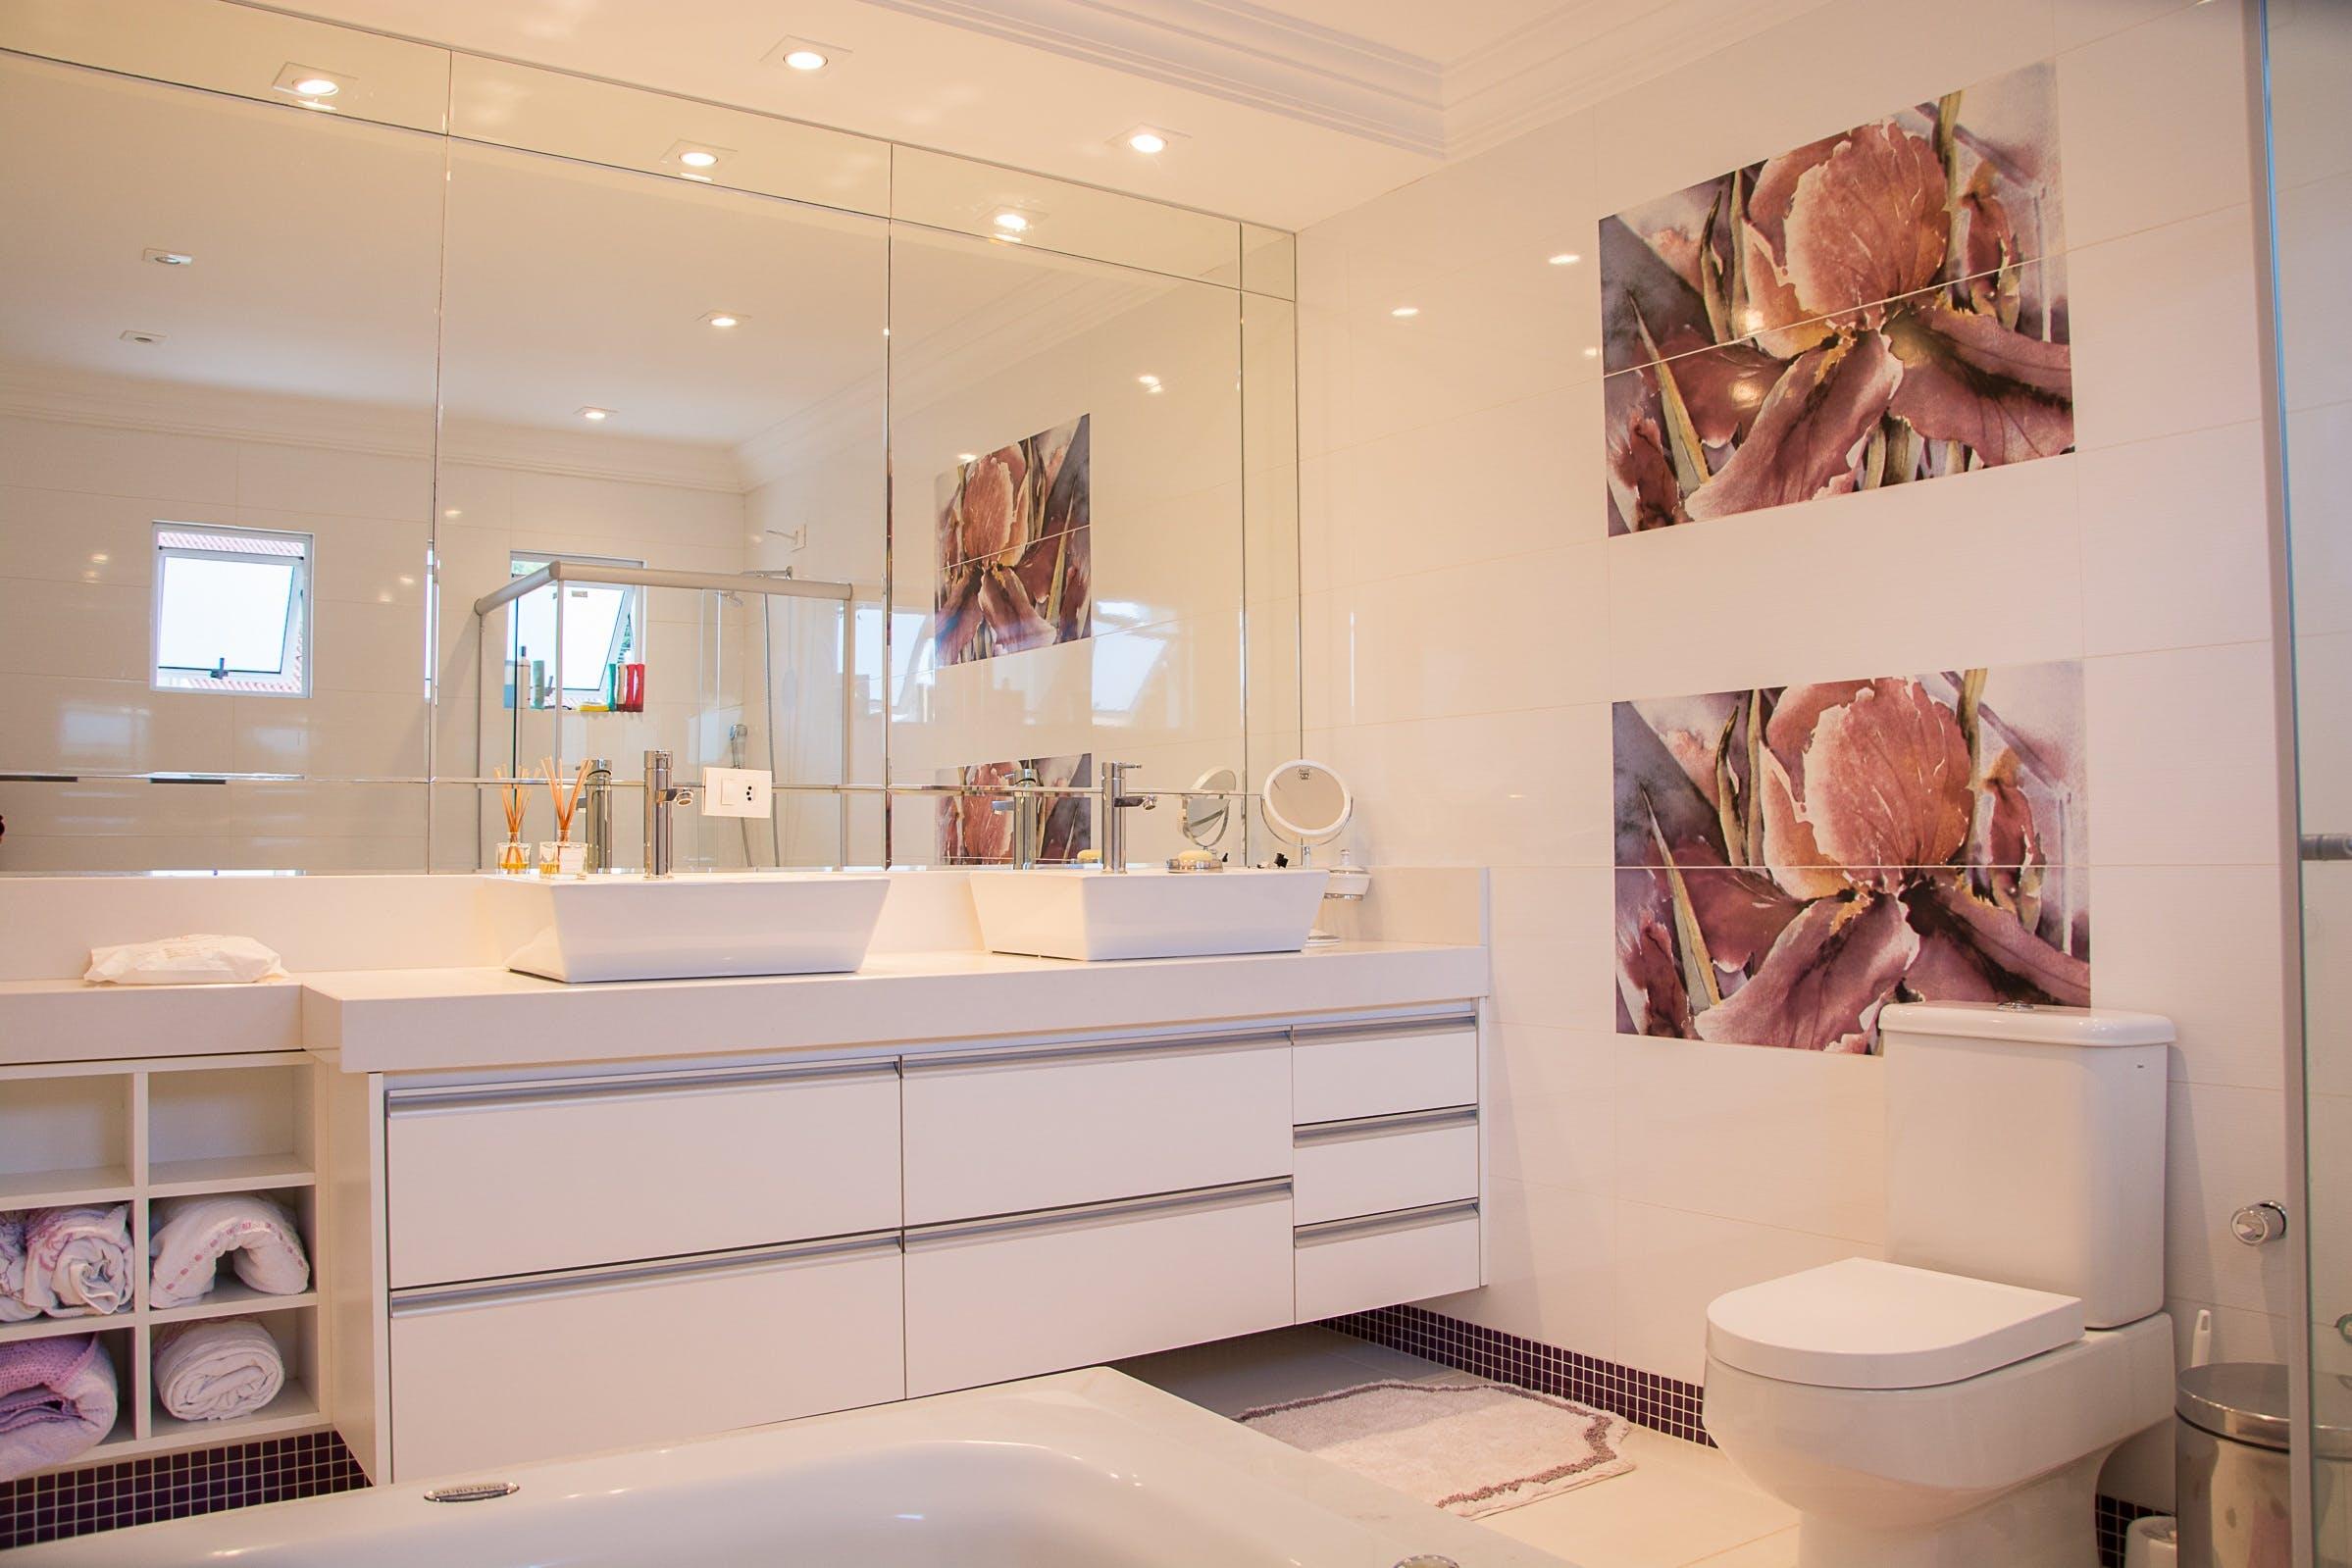 Kostnadsfri bild av arkitektur, badrum, dusch, inredningsdesign